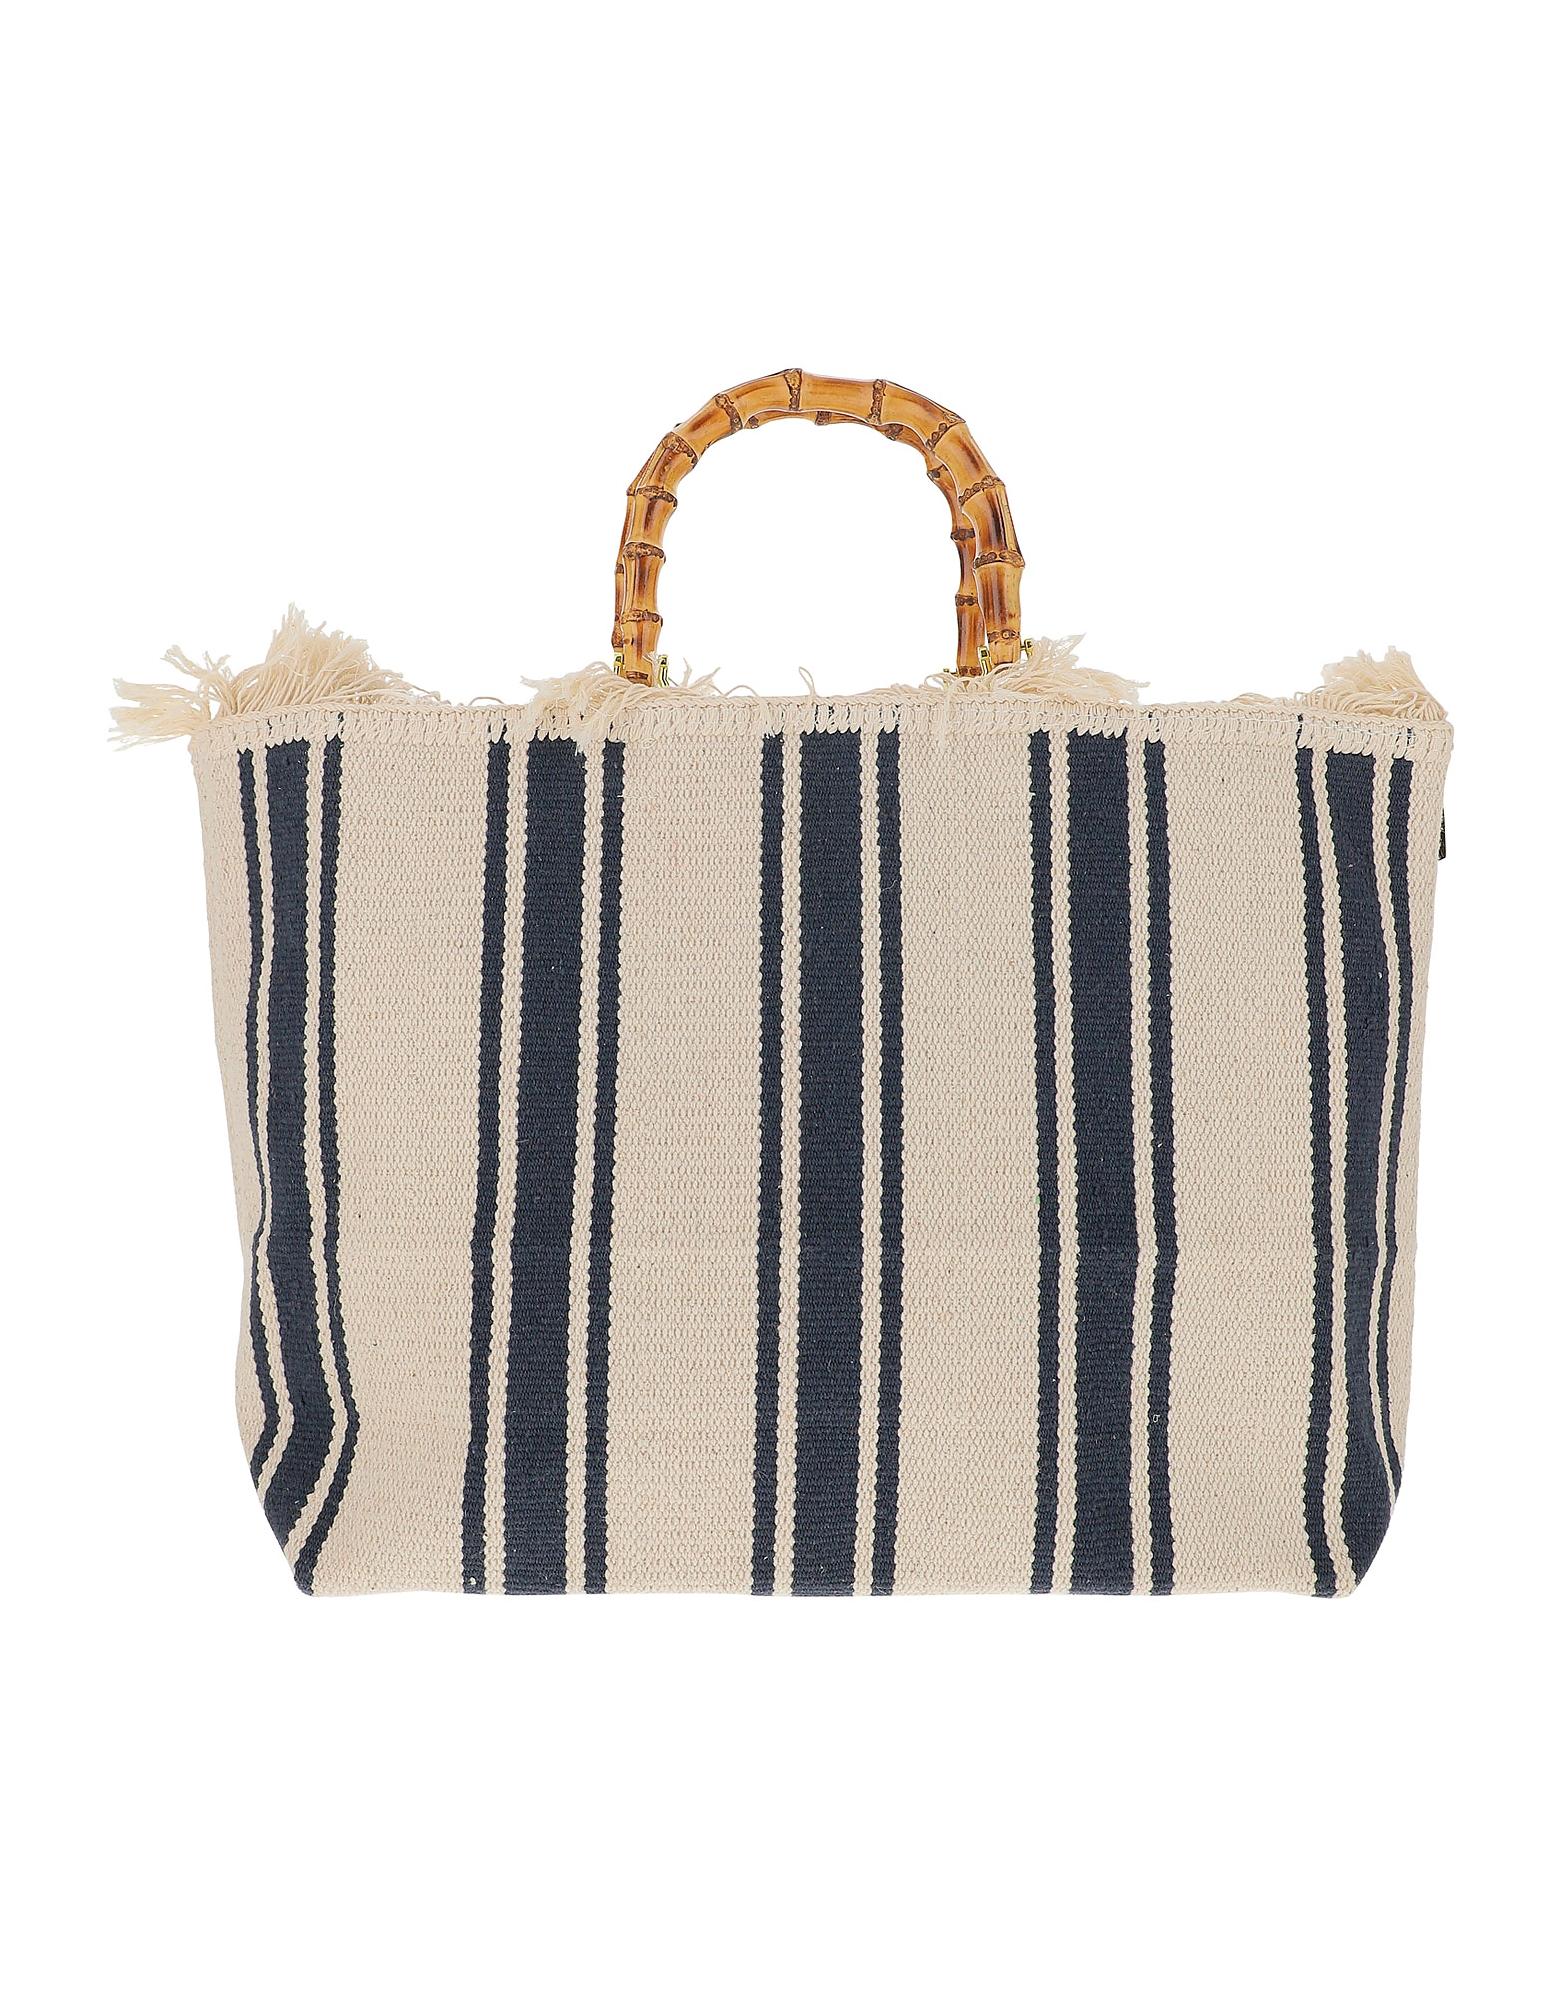 LaMILANESA Designer Handbags, Large Blue Stripes Canvas Tote bag w/Bamboo Handles